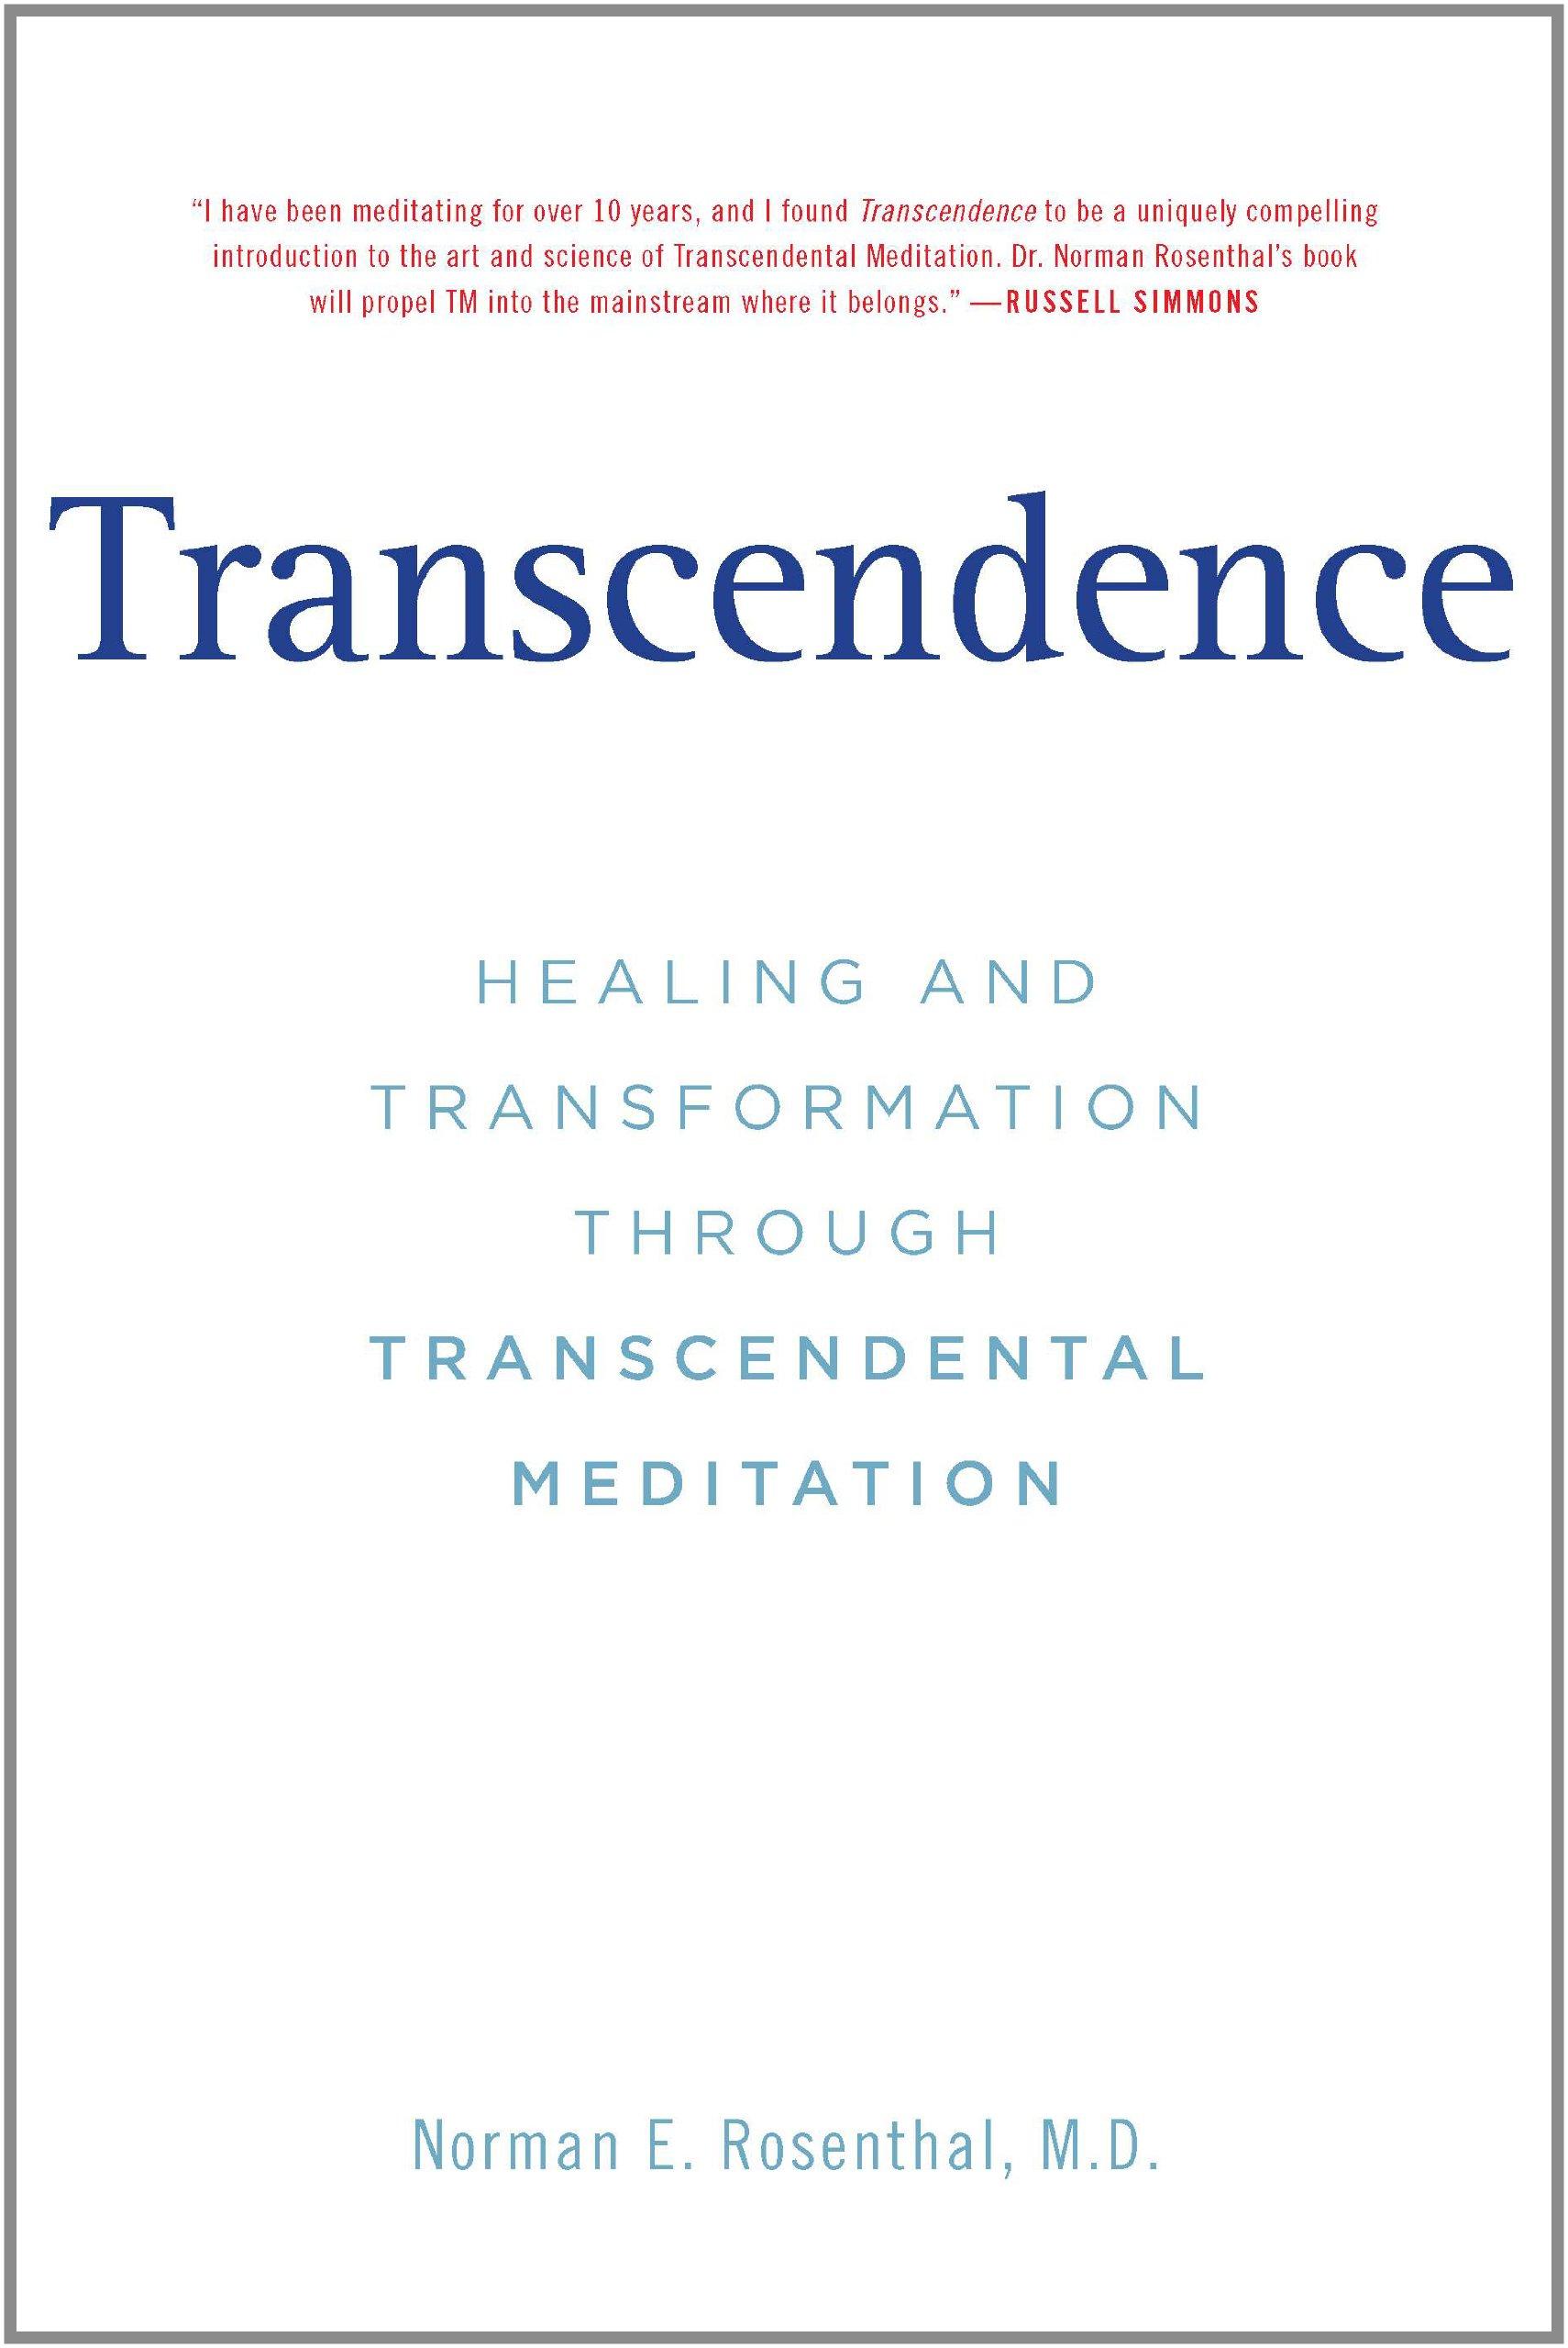 transcendence-healing-and-transformation-through-transcendental-meditation.jpeg